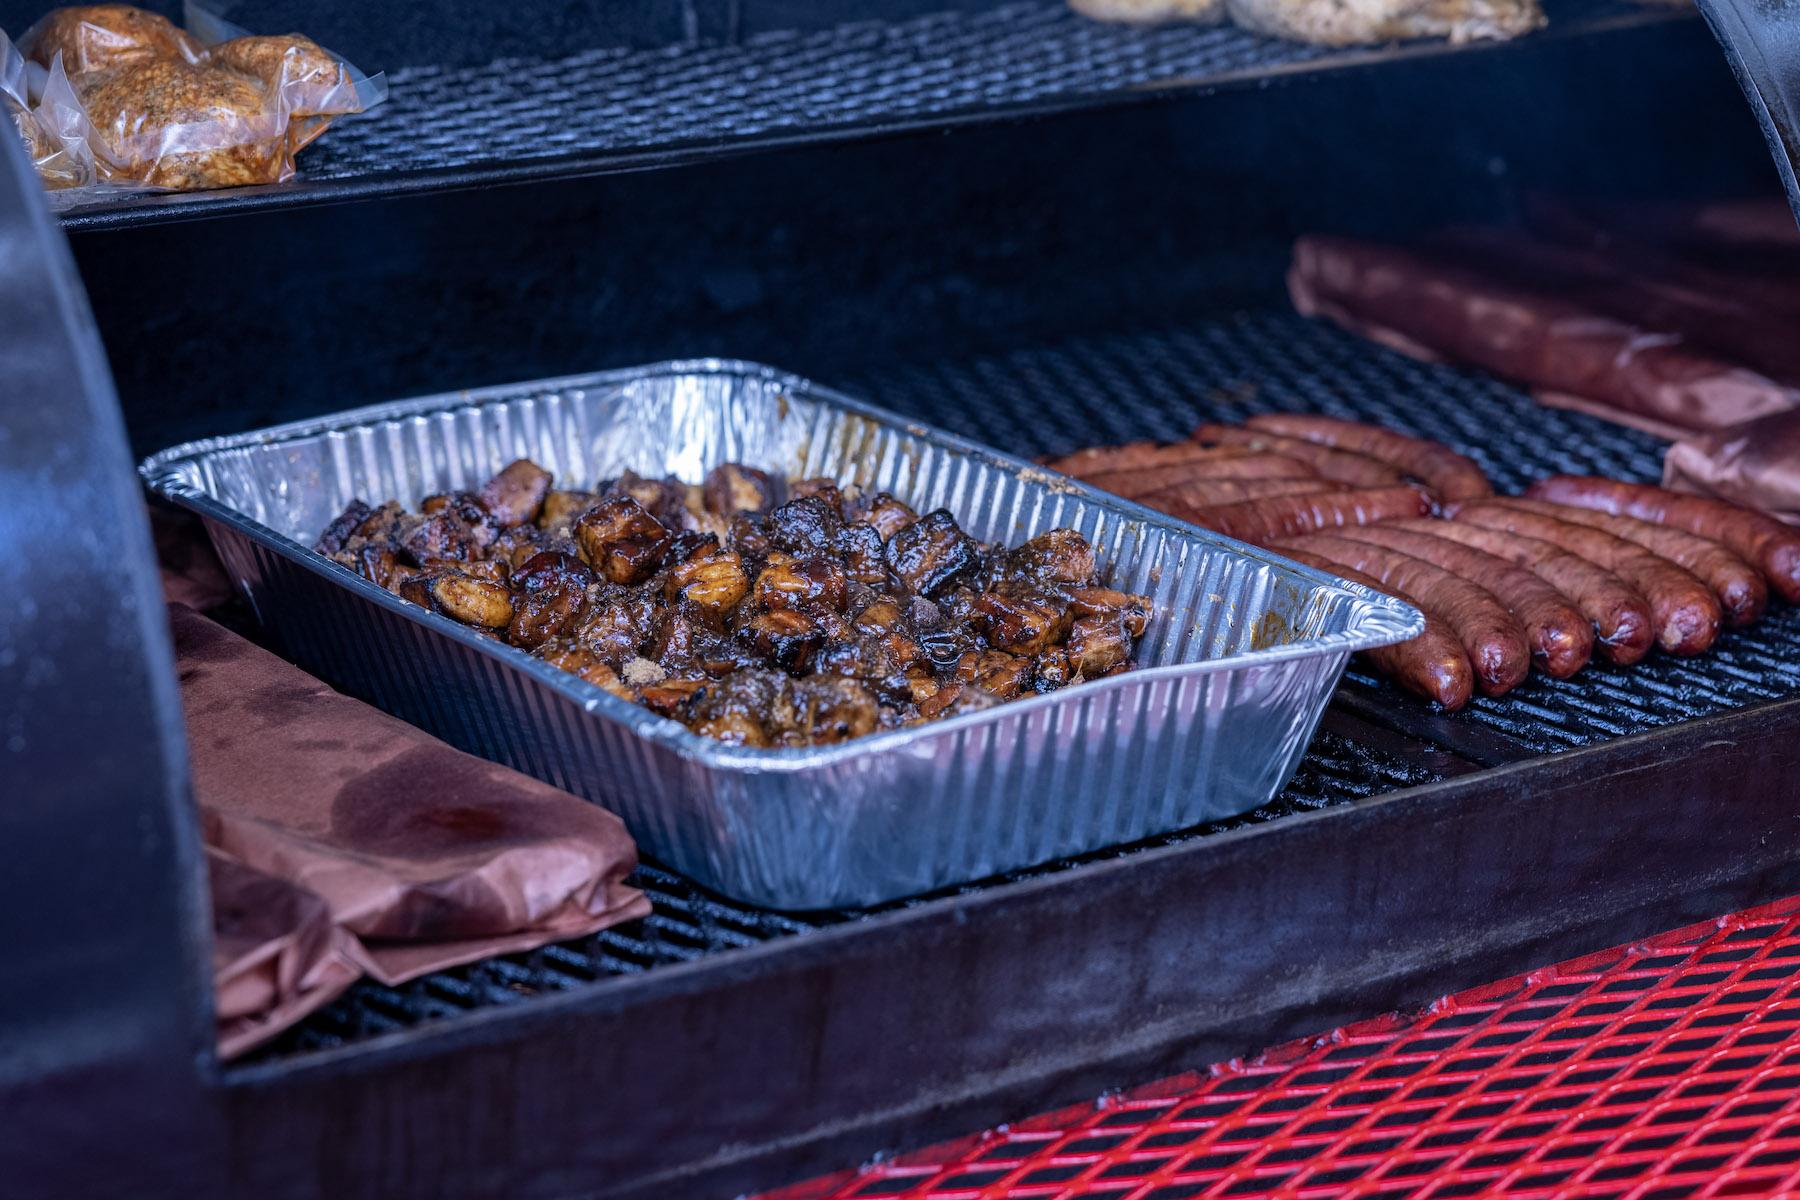 Kent Rathbun's Curbside BBQ